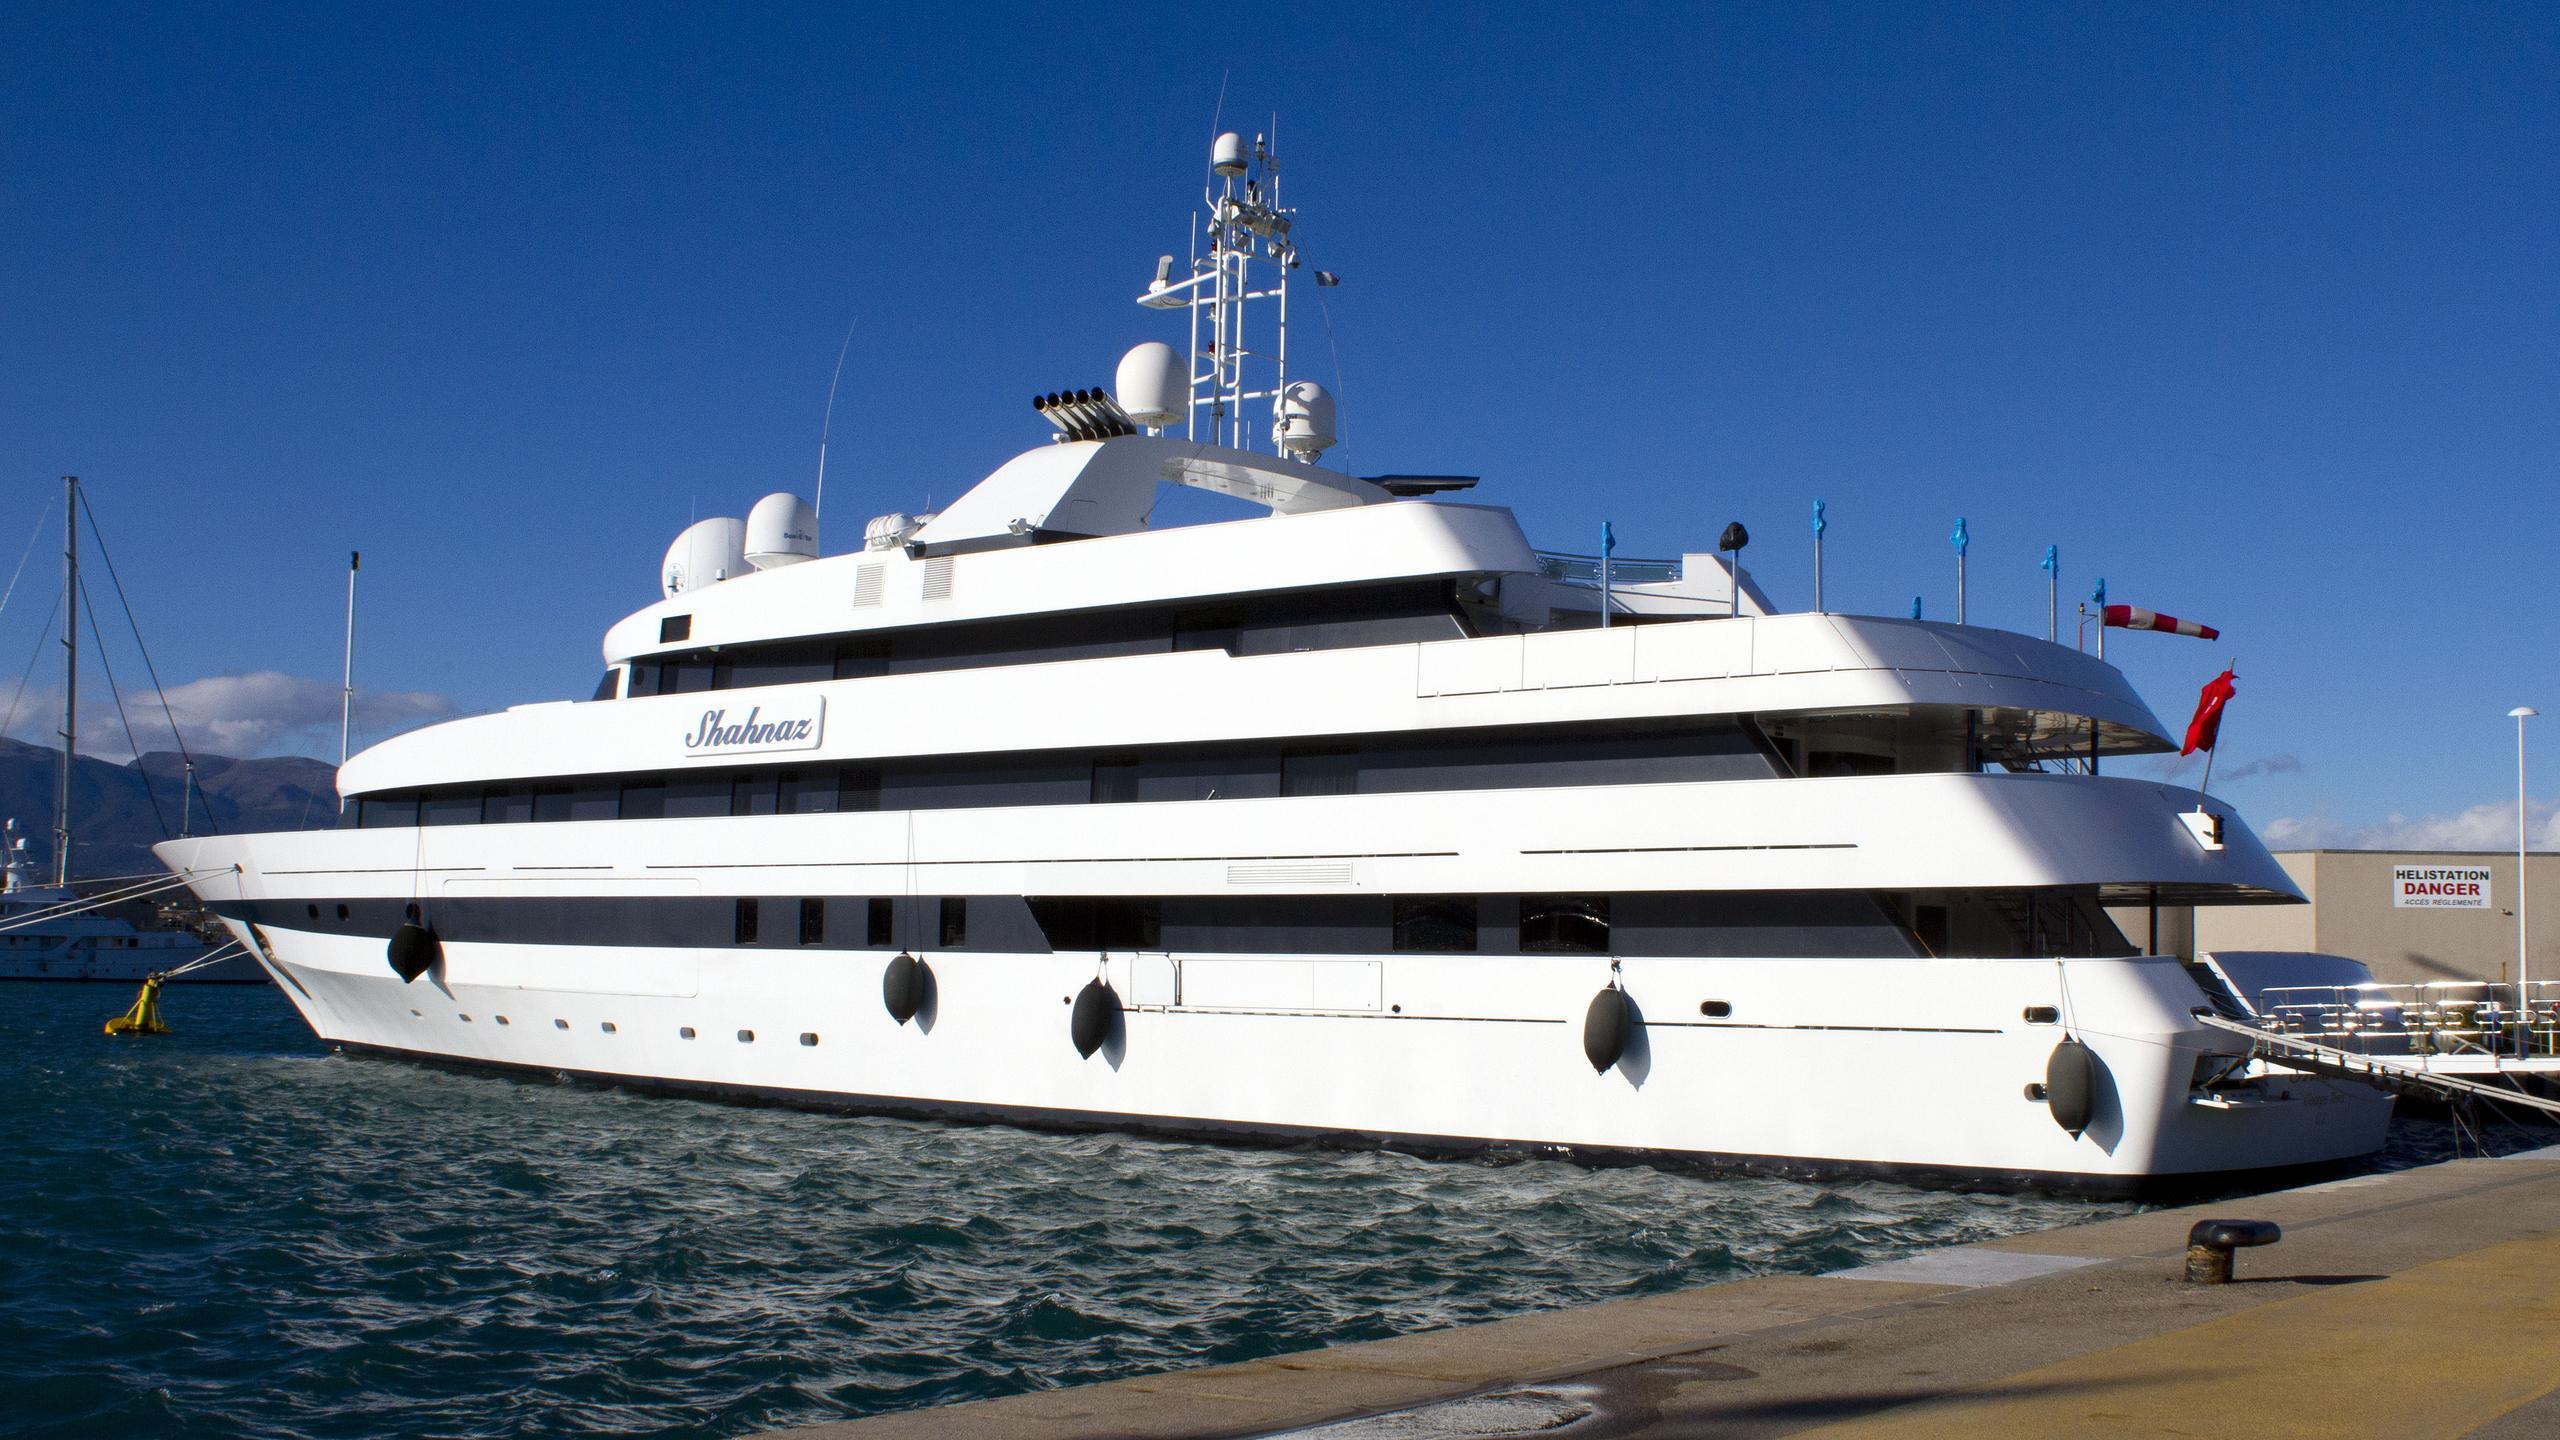 shahnaz-motor-yacht-nuovi-ligori-1991-63m-rear-profile